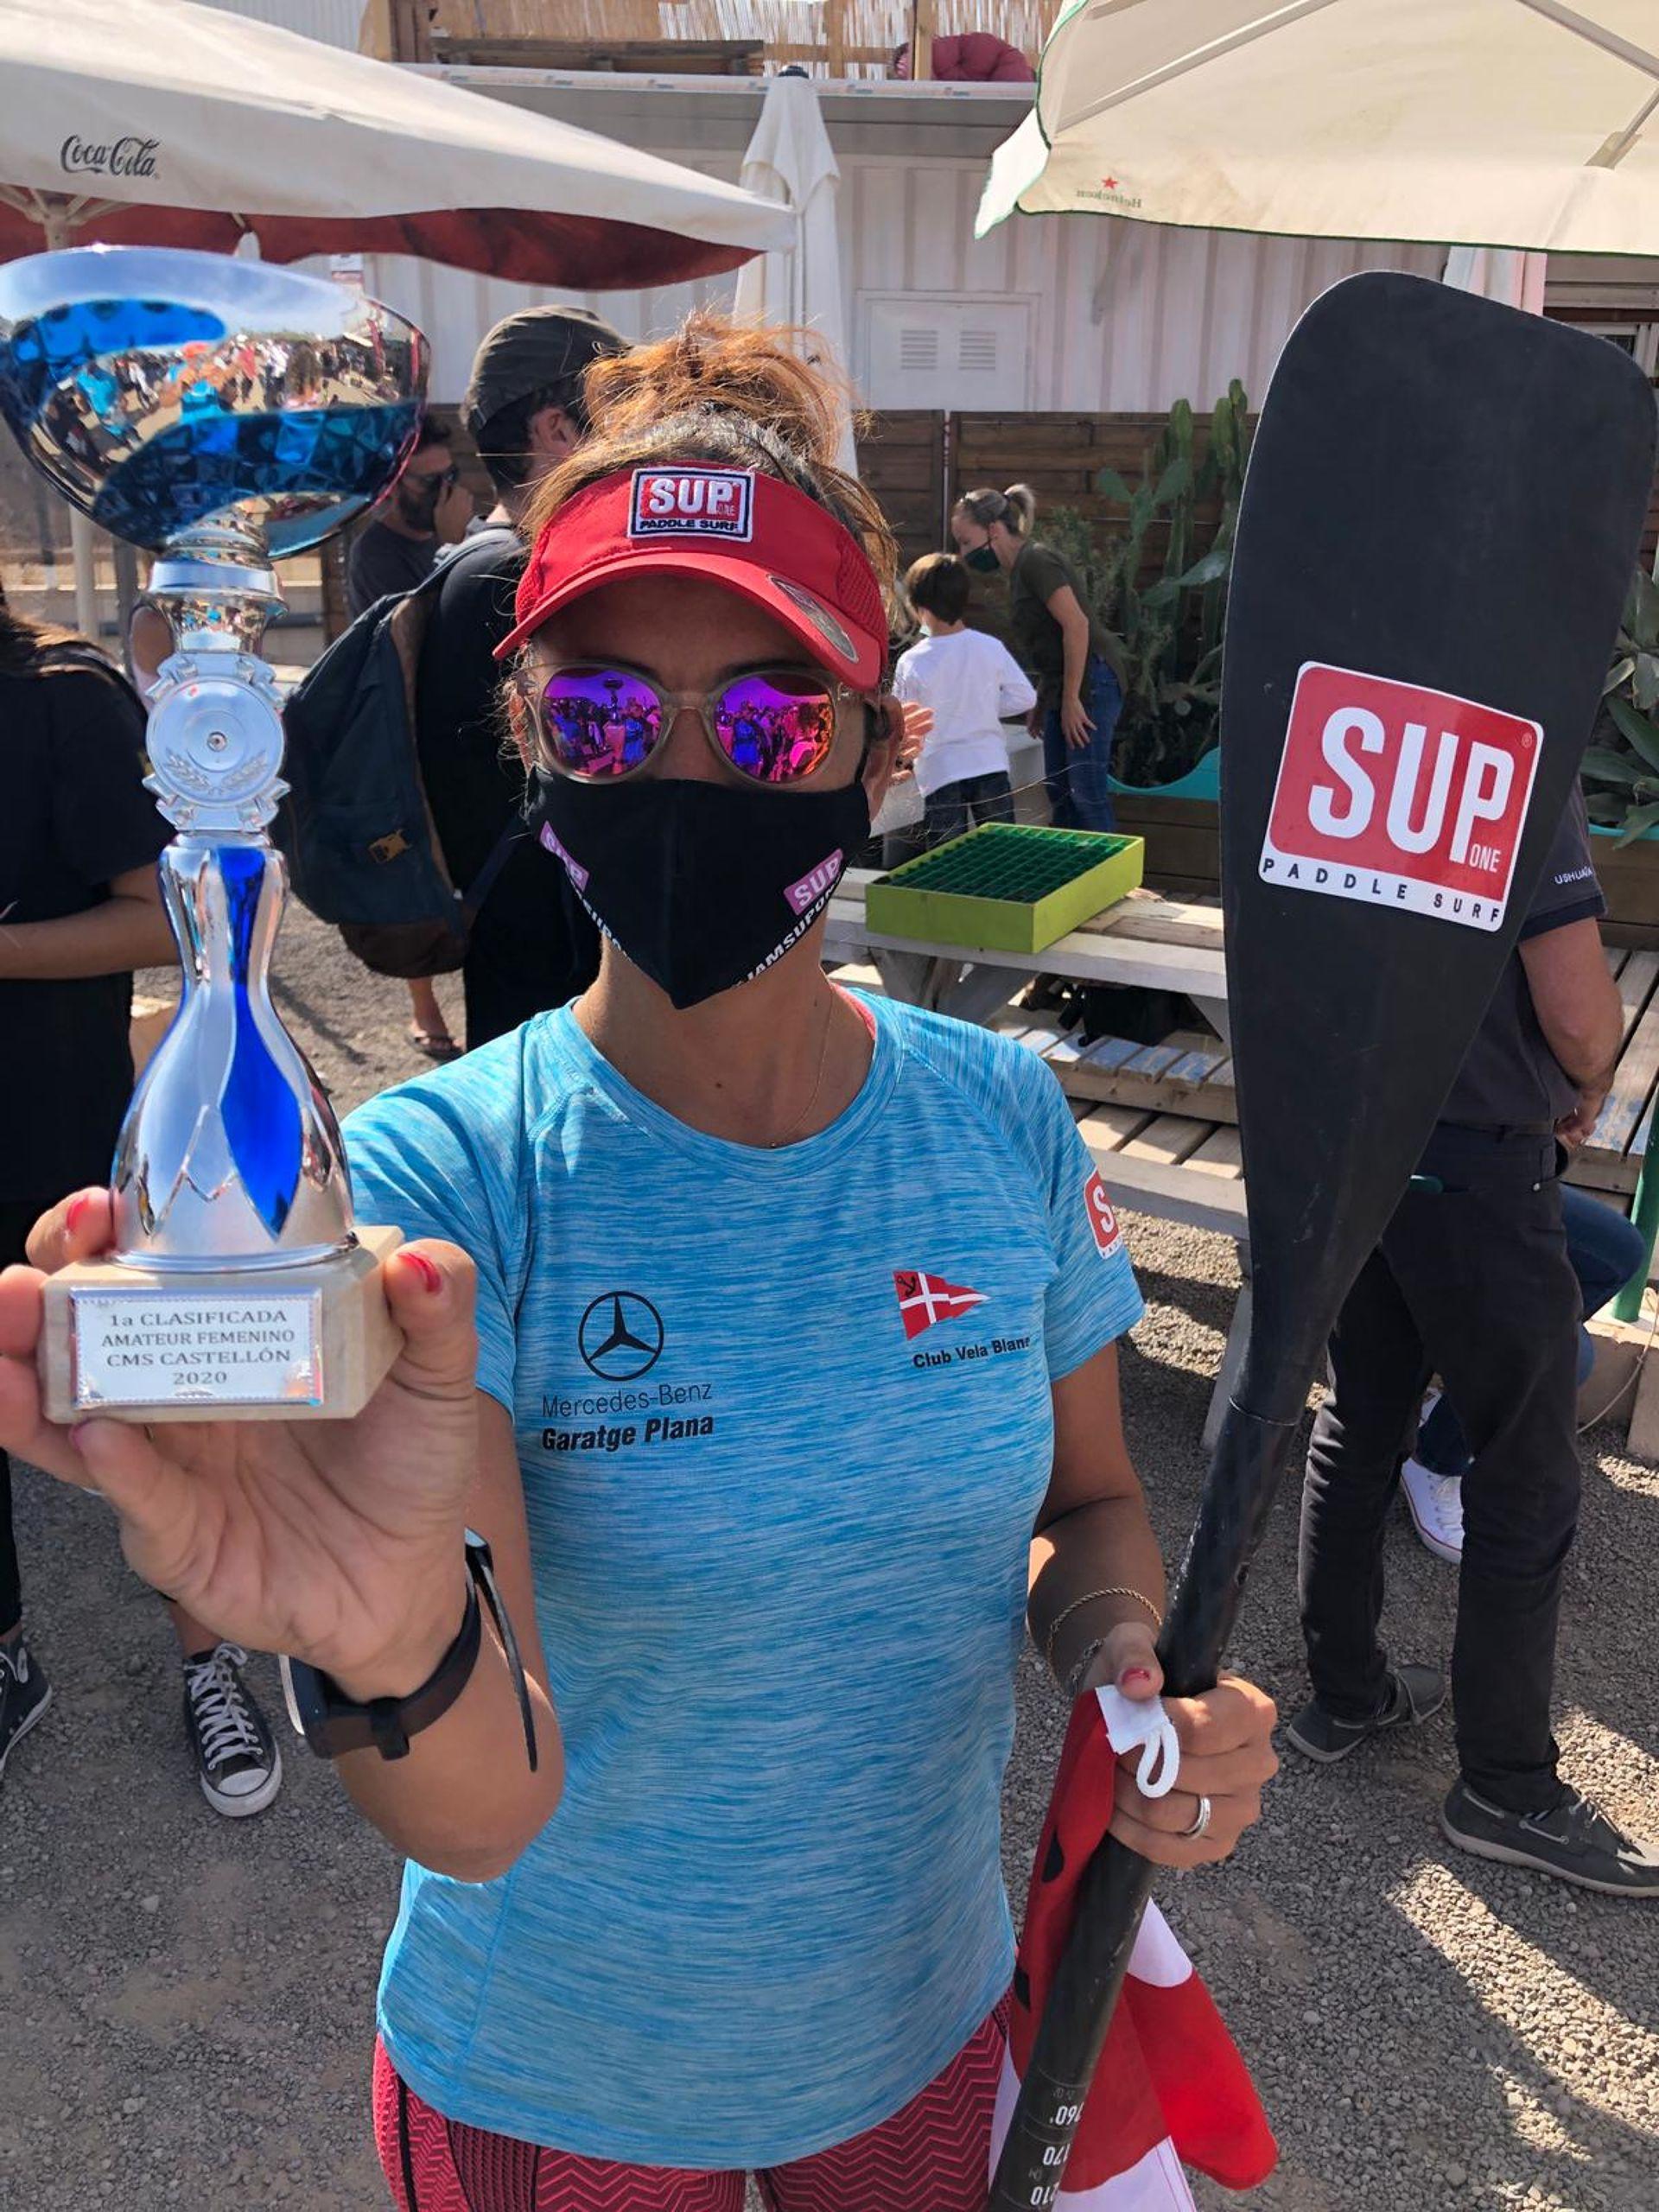 Neus Collado i Xavi Marina podi al III Circuit Provincial Castellón SupRace